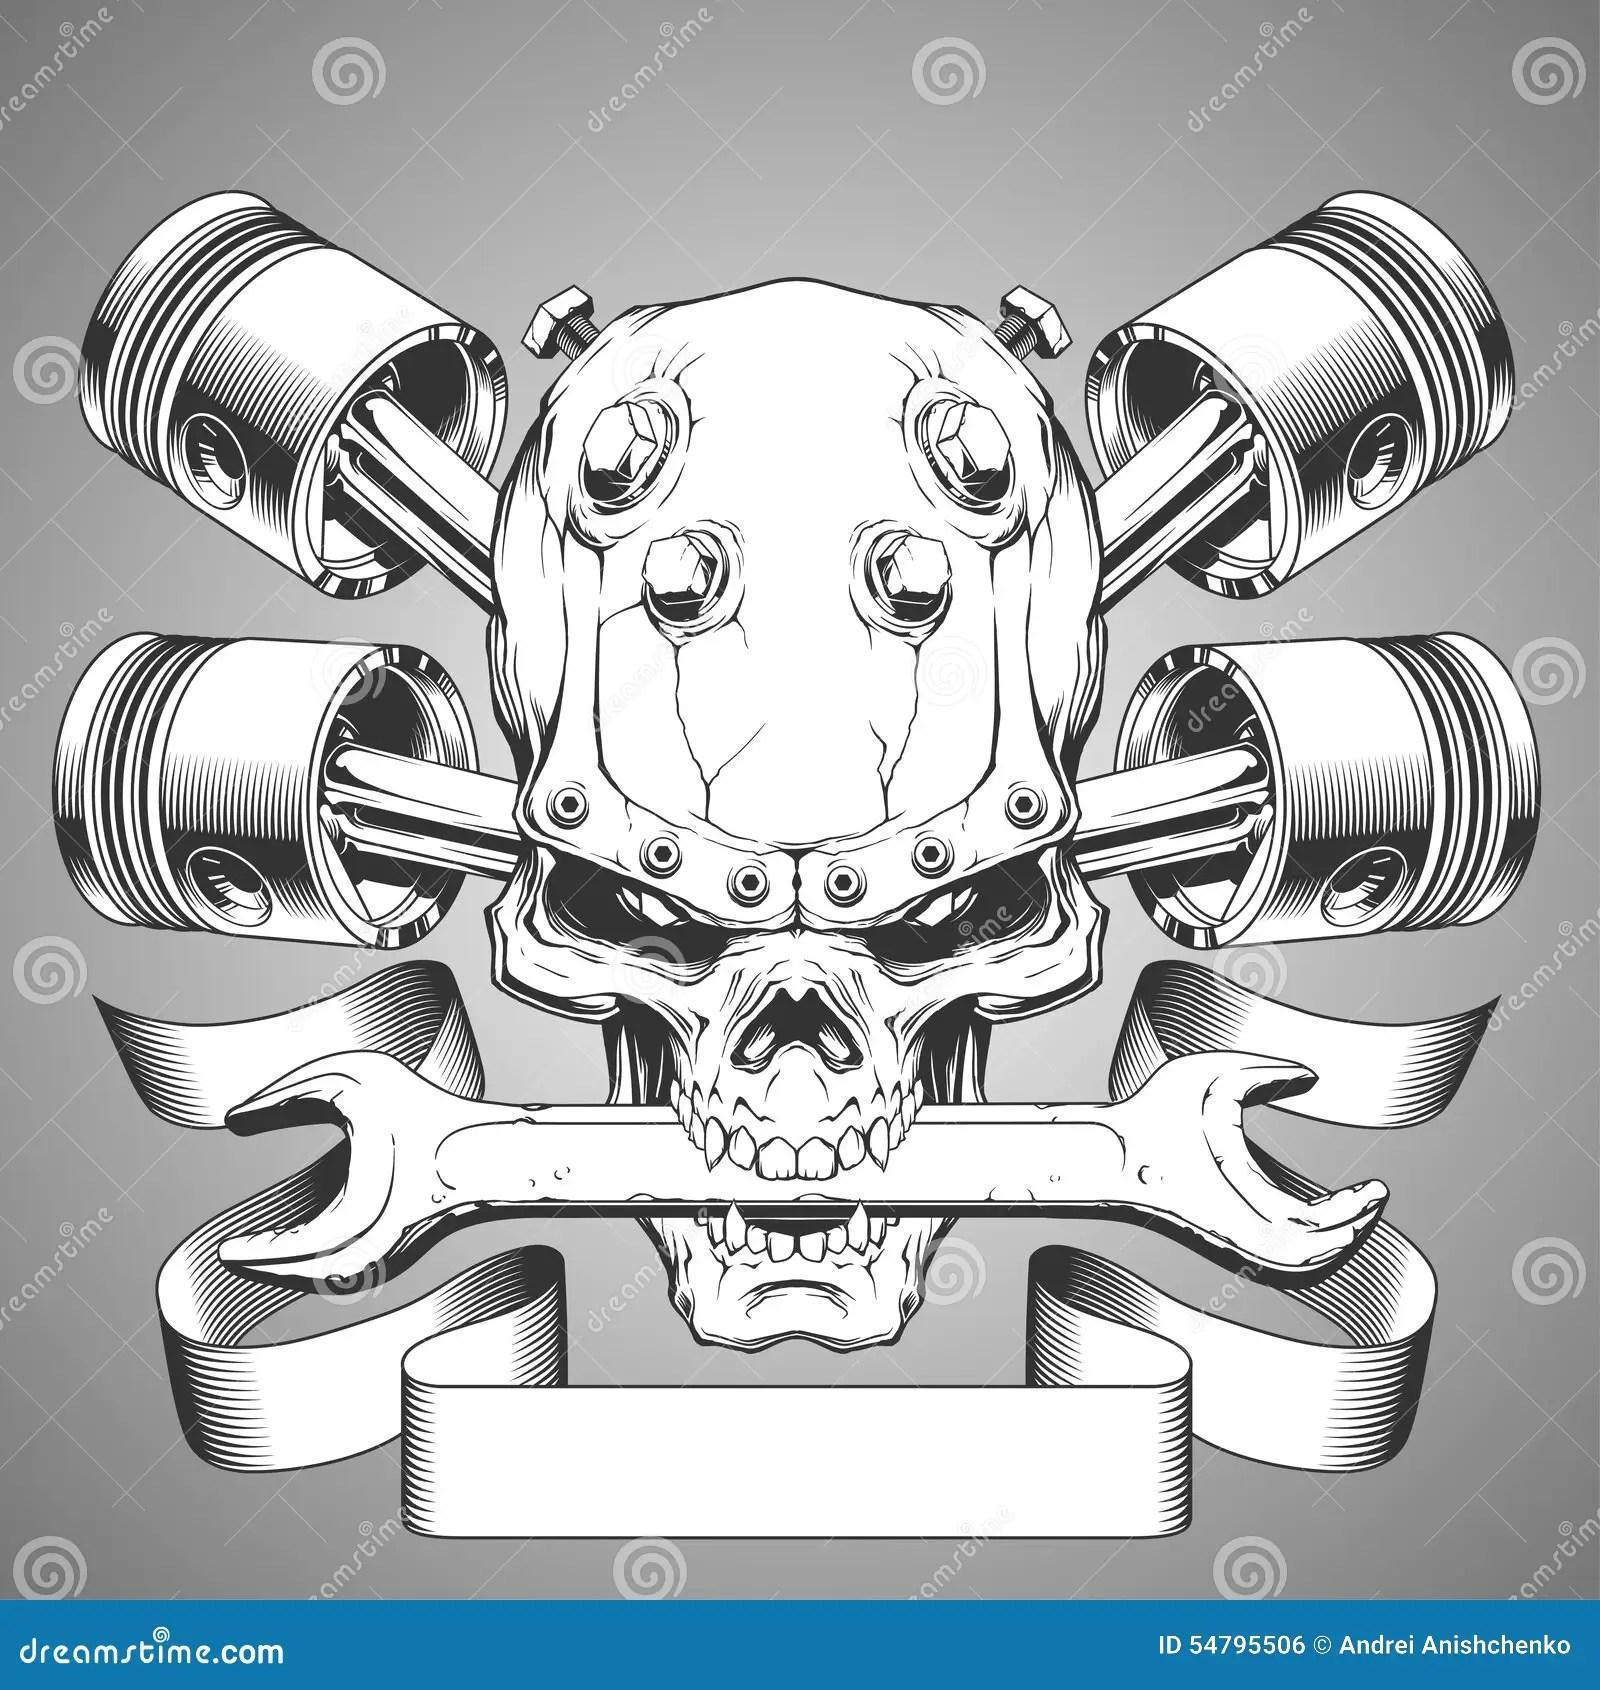 Motor Cartoons Illustrations Amp Vector Stock Images